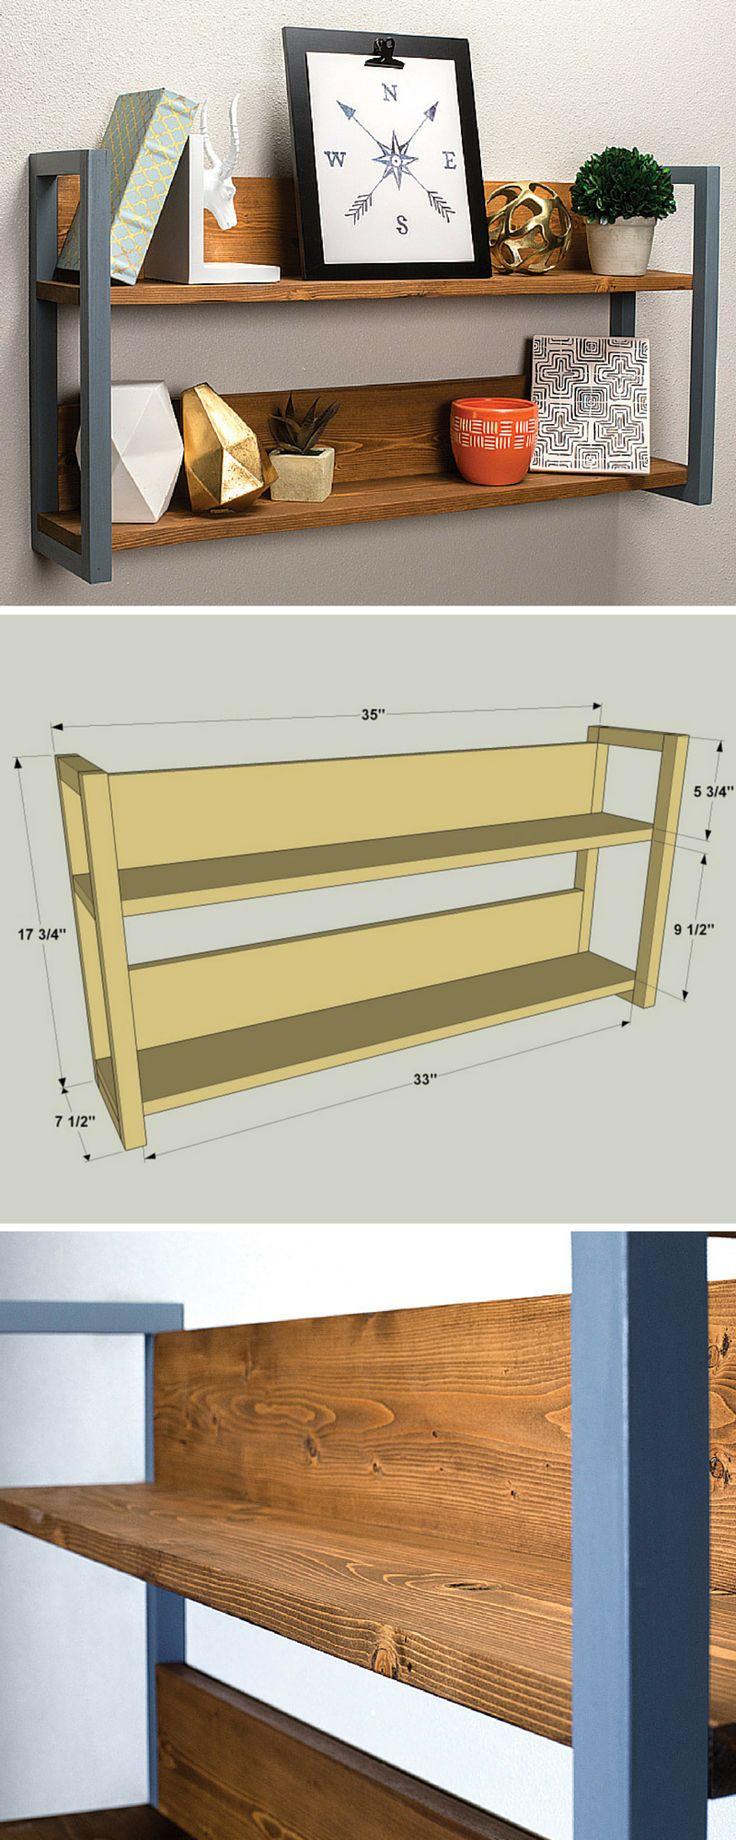 best  wall shelf unit ideas on pinterest  shelf units vanity  - best  wall shelf unit ideas on pinterest  shelf units vanity unitsikea and bathroom shelf unit